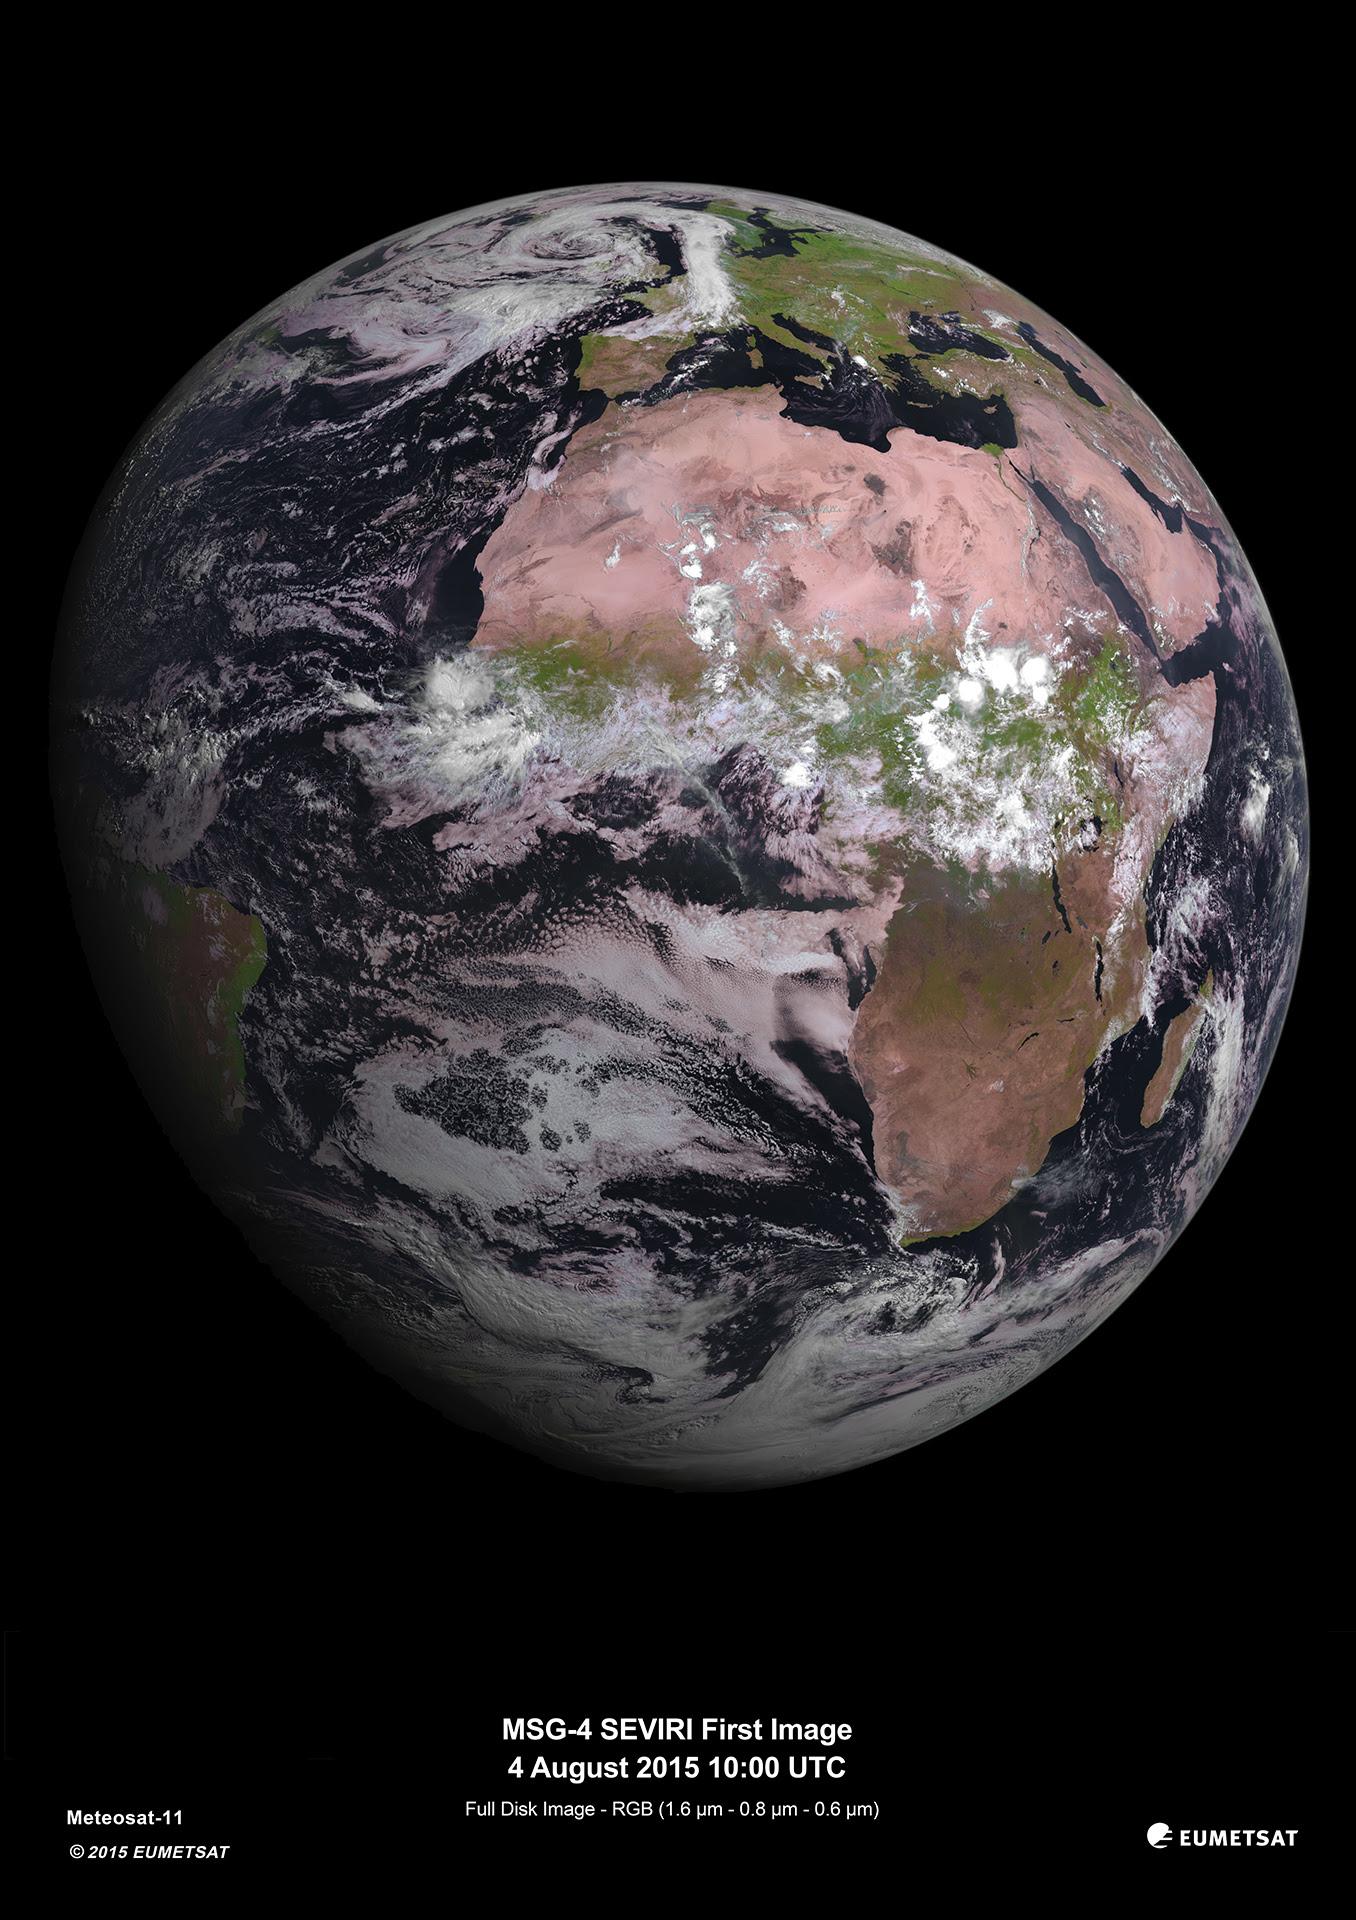 MSG-4: A new European weather satellite.